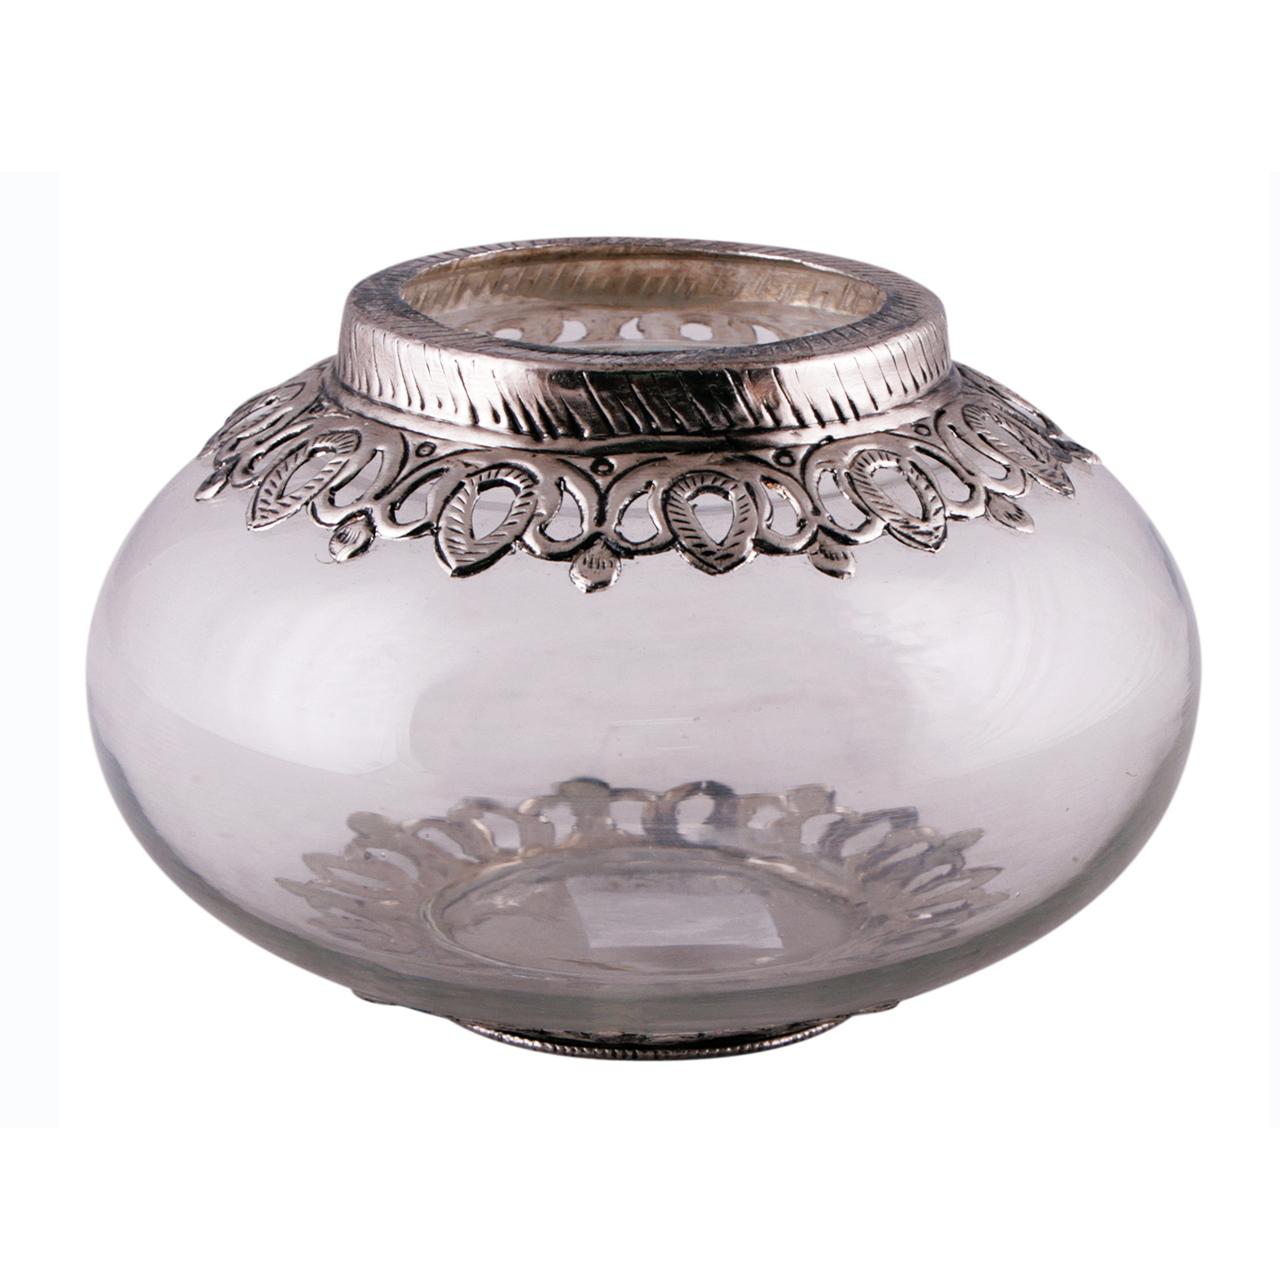 Bol Decorativ Rotund Din Sticla Si Metal 18 Cm